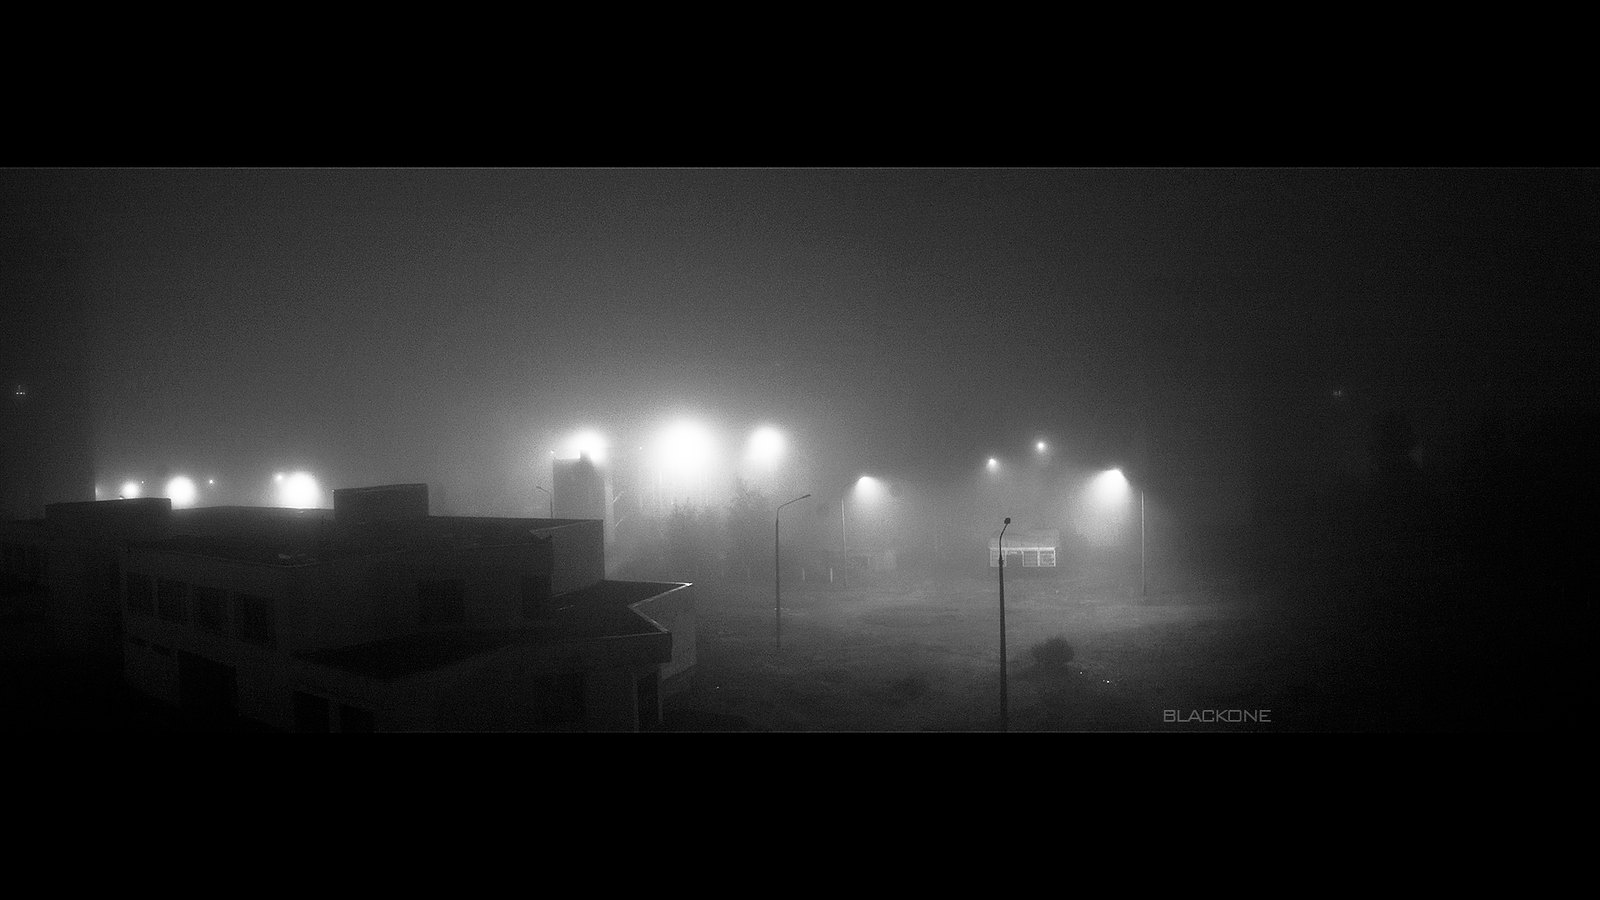 Туман накрыл Киев, глубокая ночь